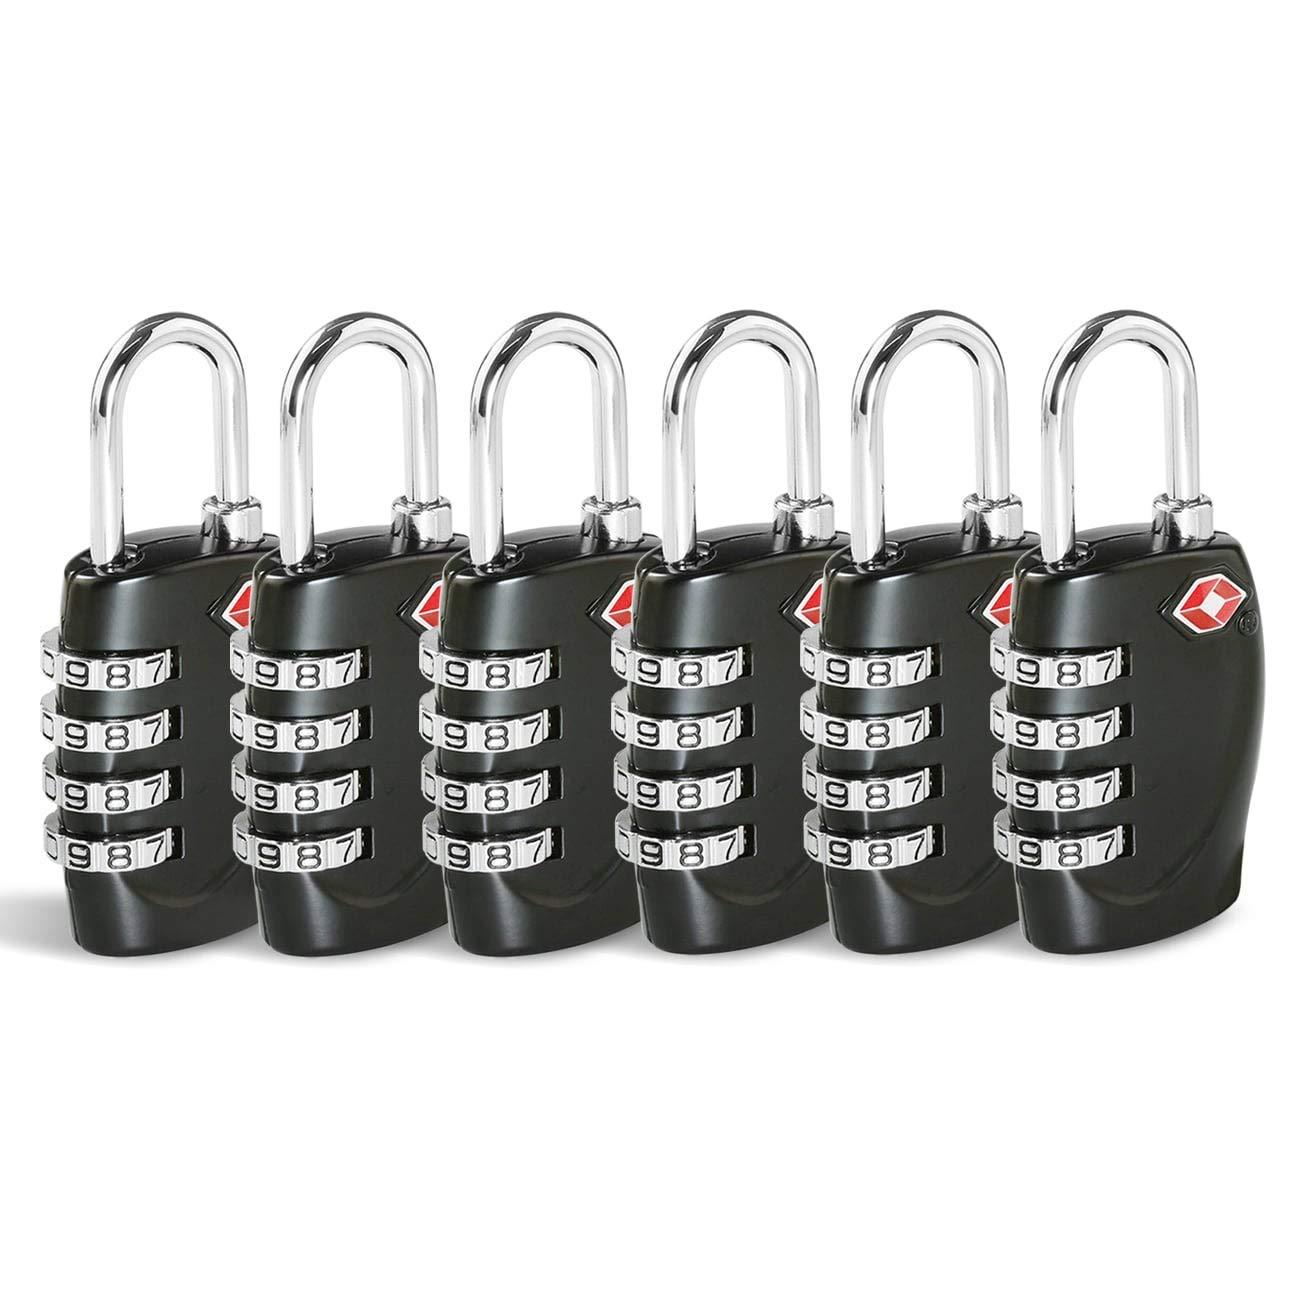 TSA Security Combination Lock Suitcase Luggage Bag Code Lock Padlock Black-2 Pack